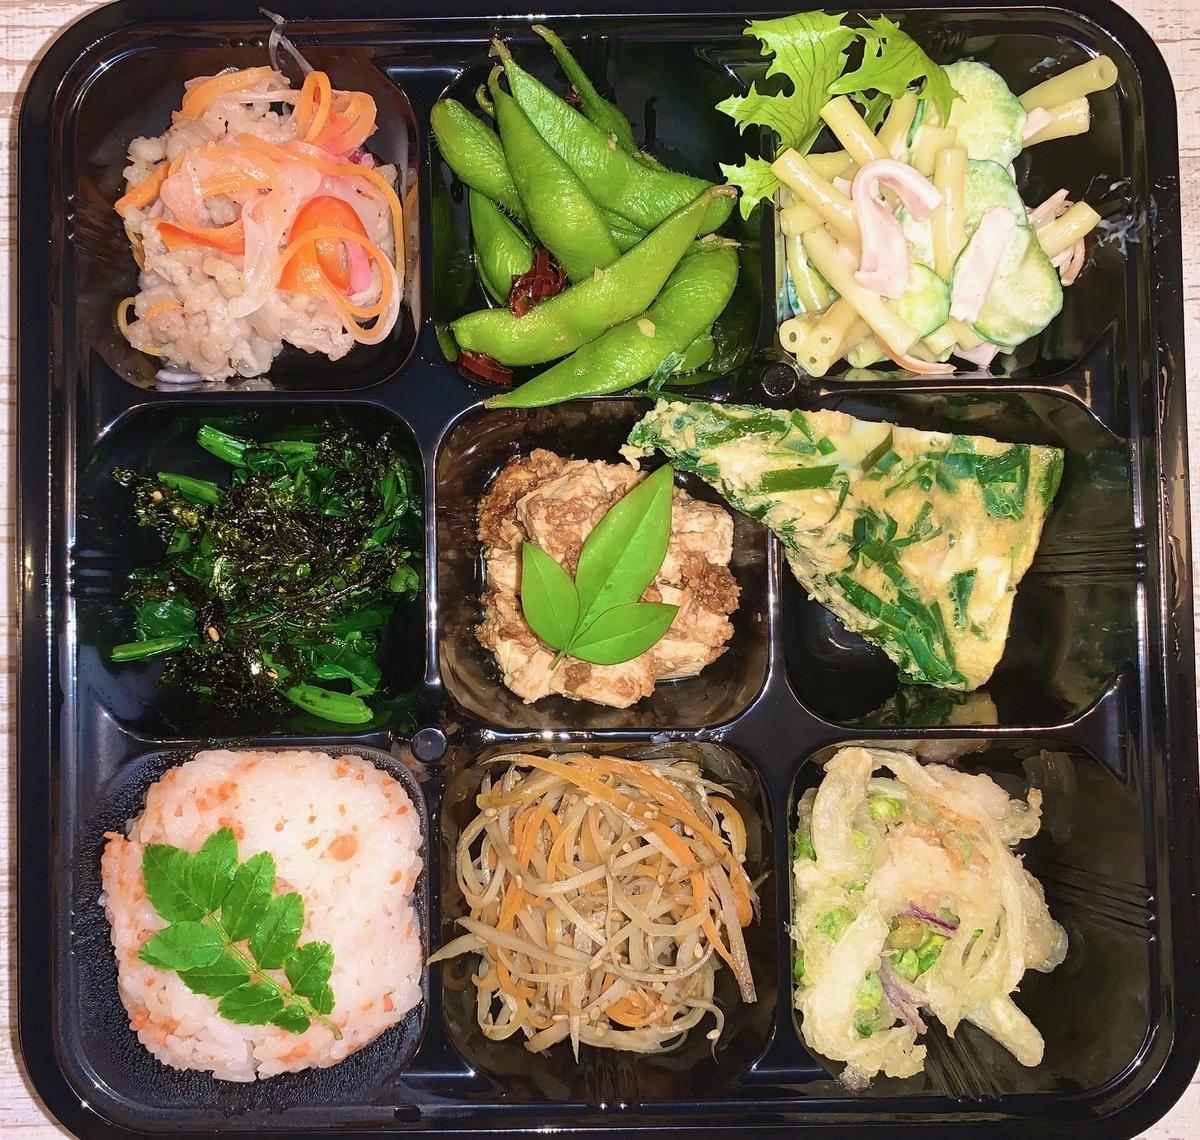 Kazun(カズン)のテイクアウト「お晩菜セット」の写真